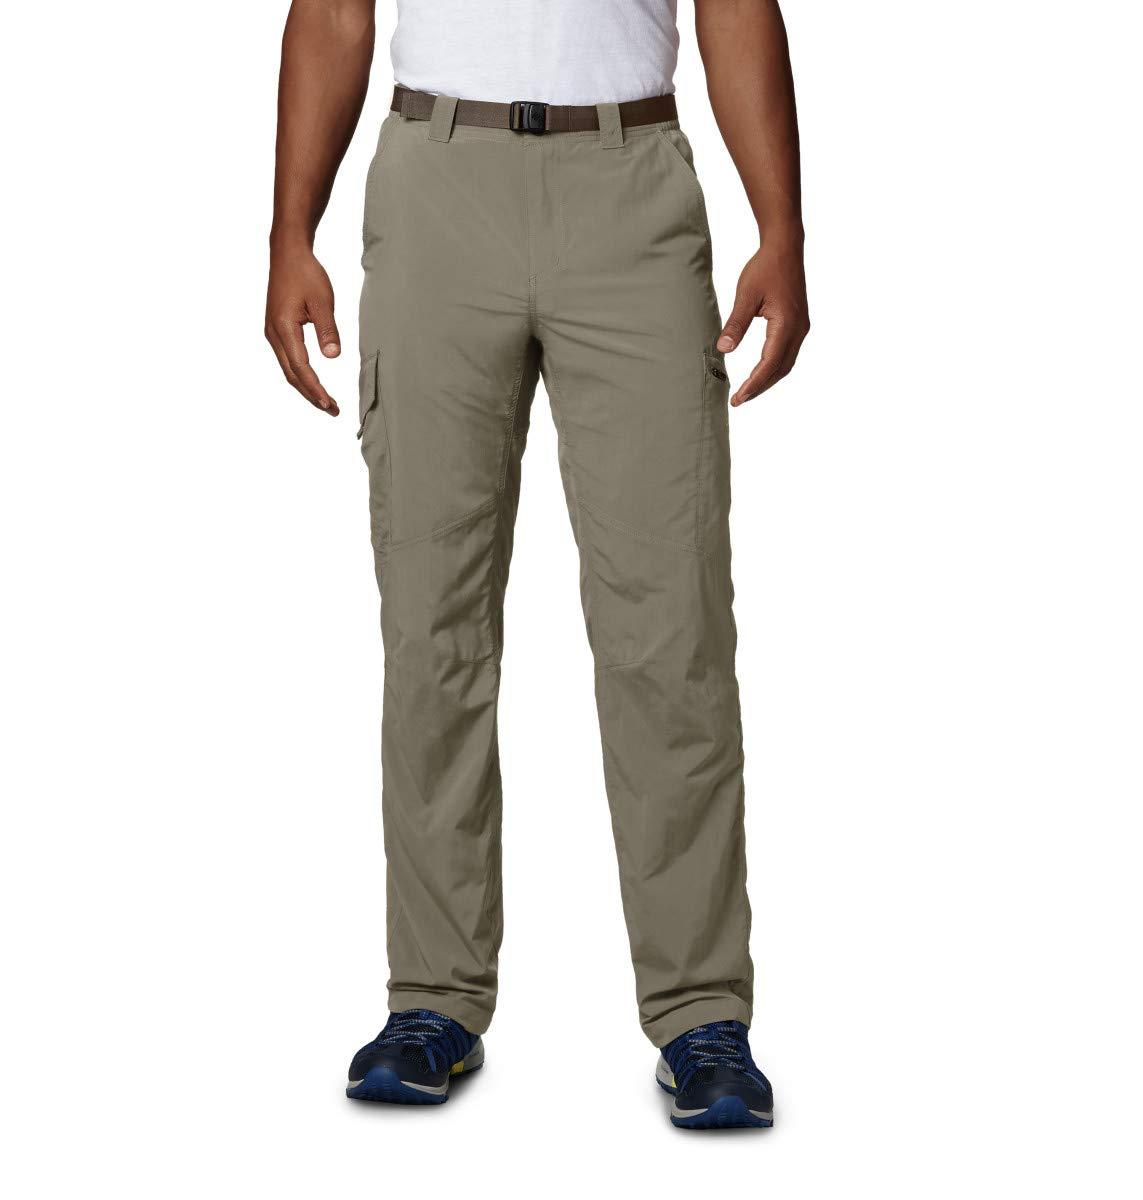 Columbia Men's  Men's Silver Ridge Cargo Pant , Tusk, 34x32 by Columbia